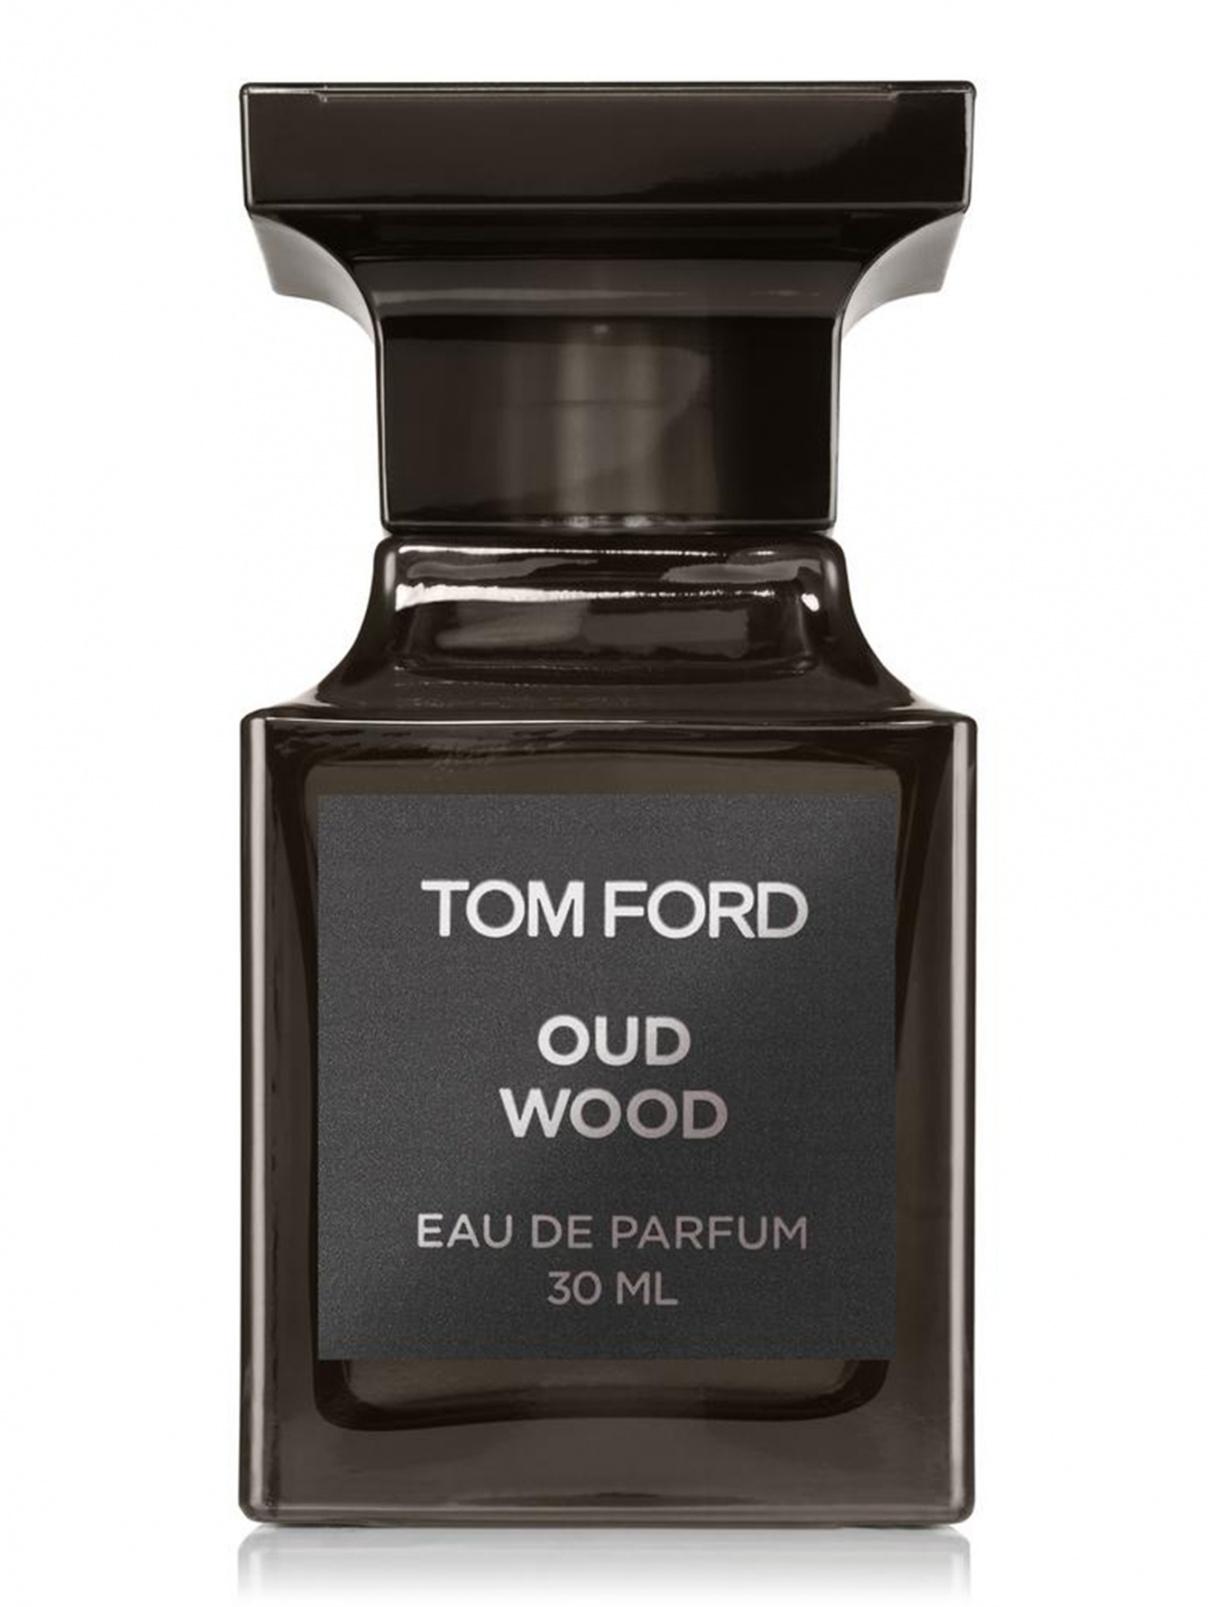 Парфюмерная вода Oud Wood, 30 мл Tom Ford  –  Общий вид